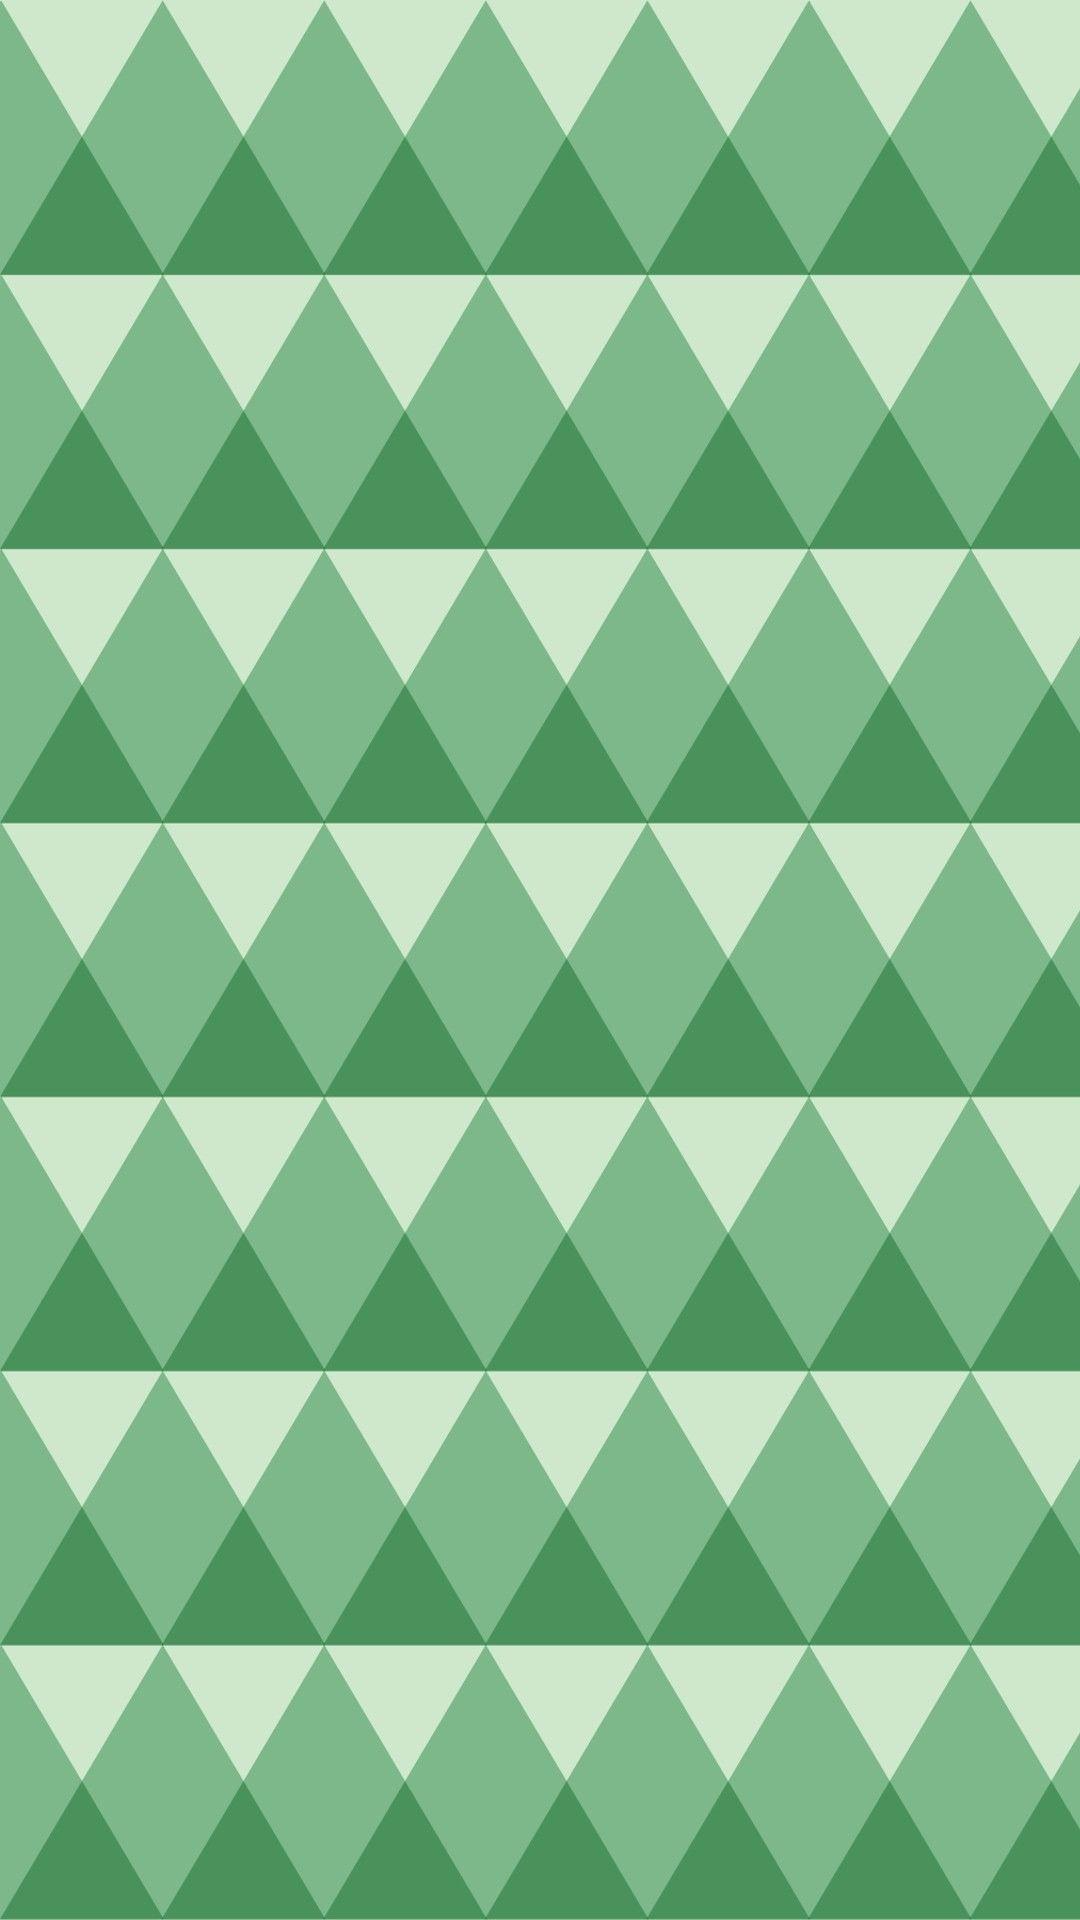 Geometric iphone 8 plus wallpaper